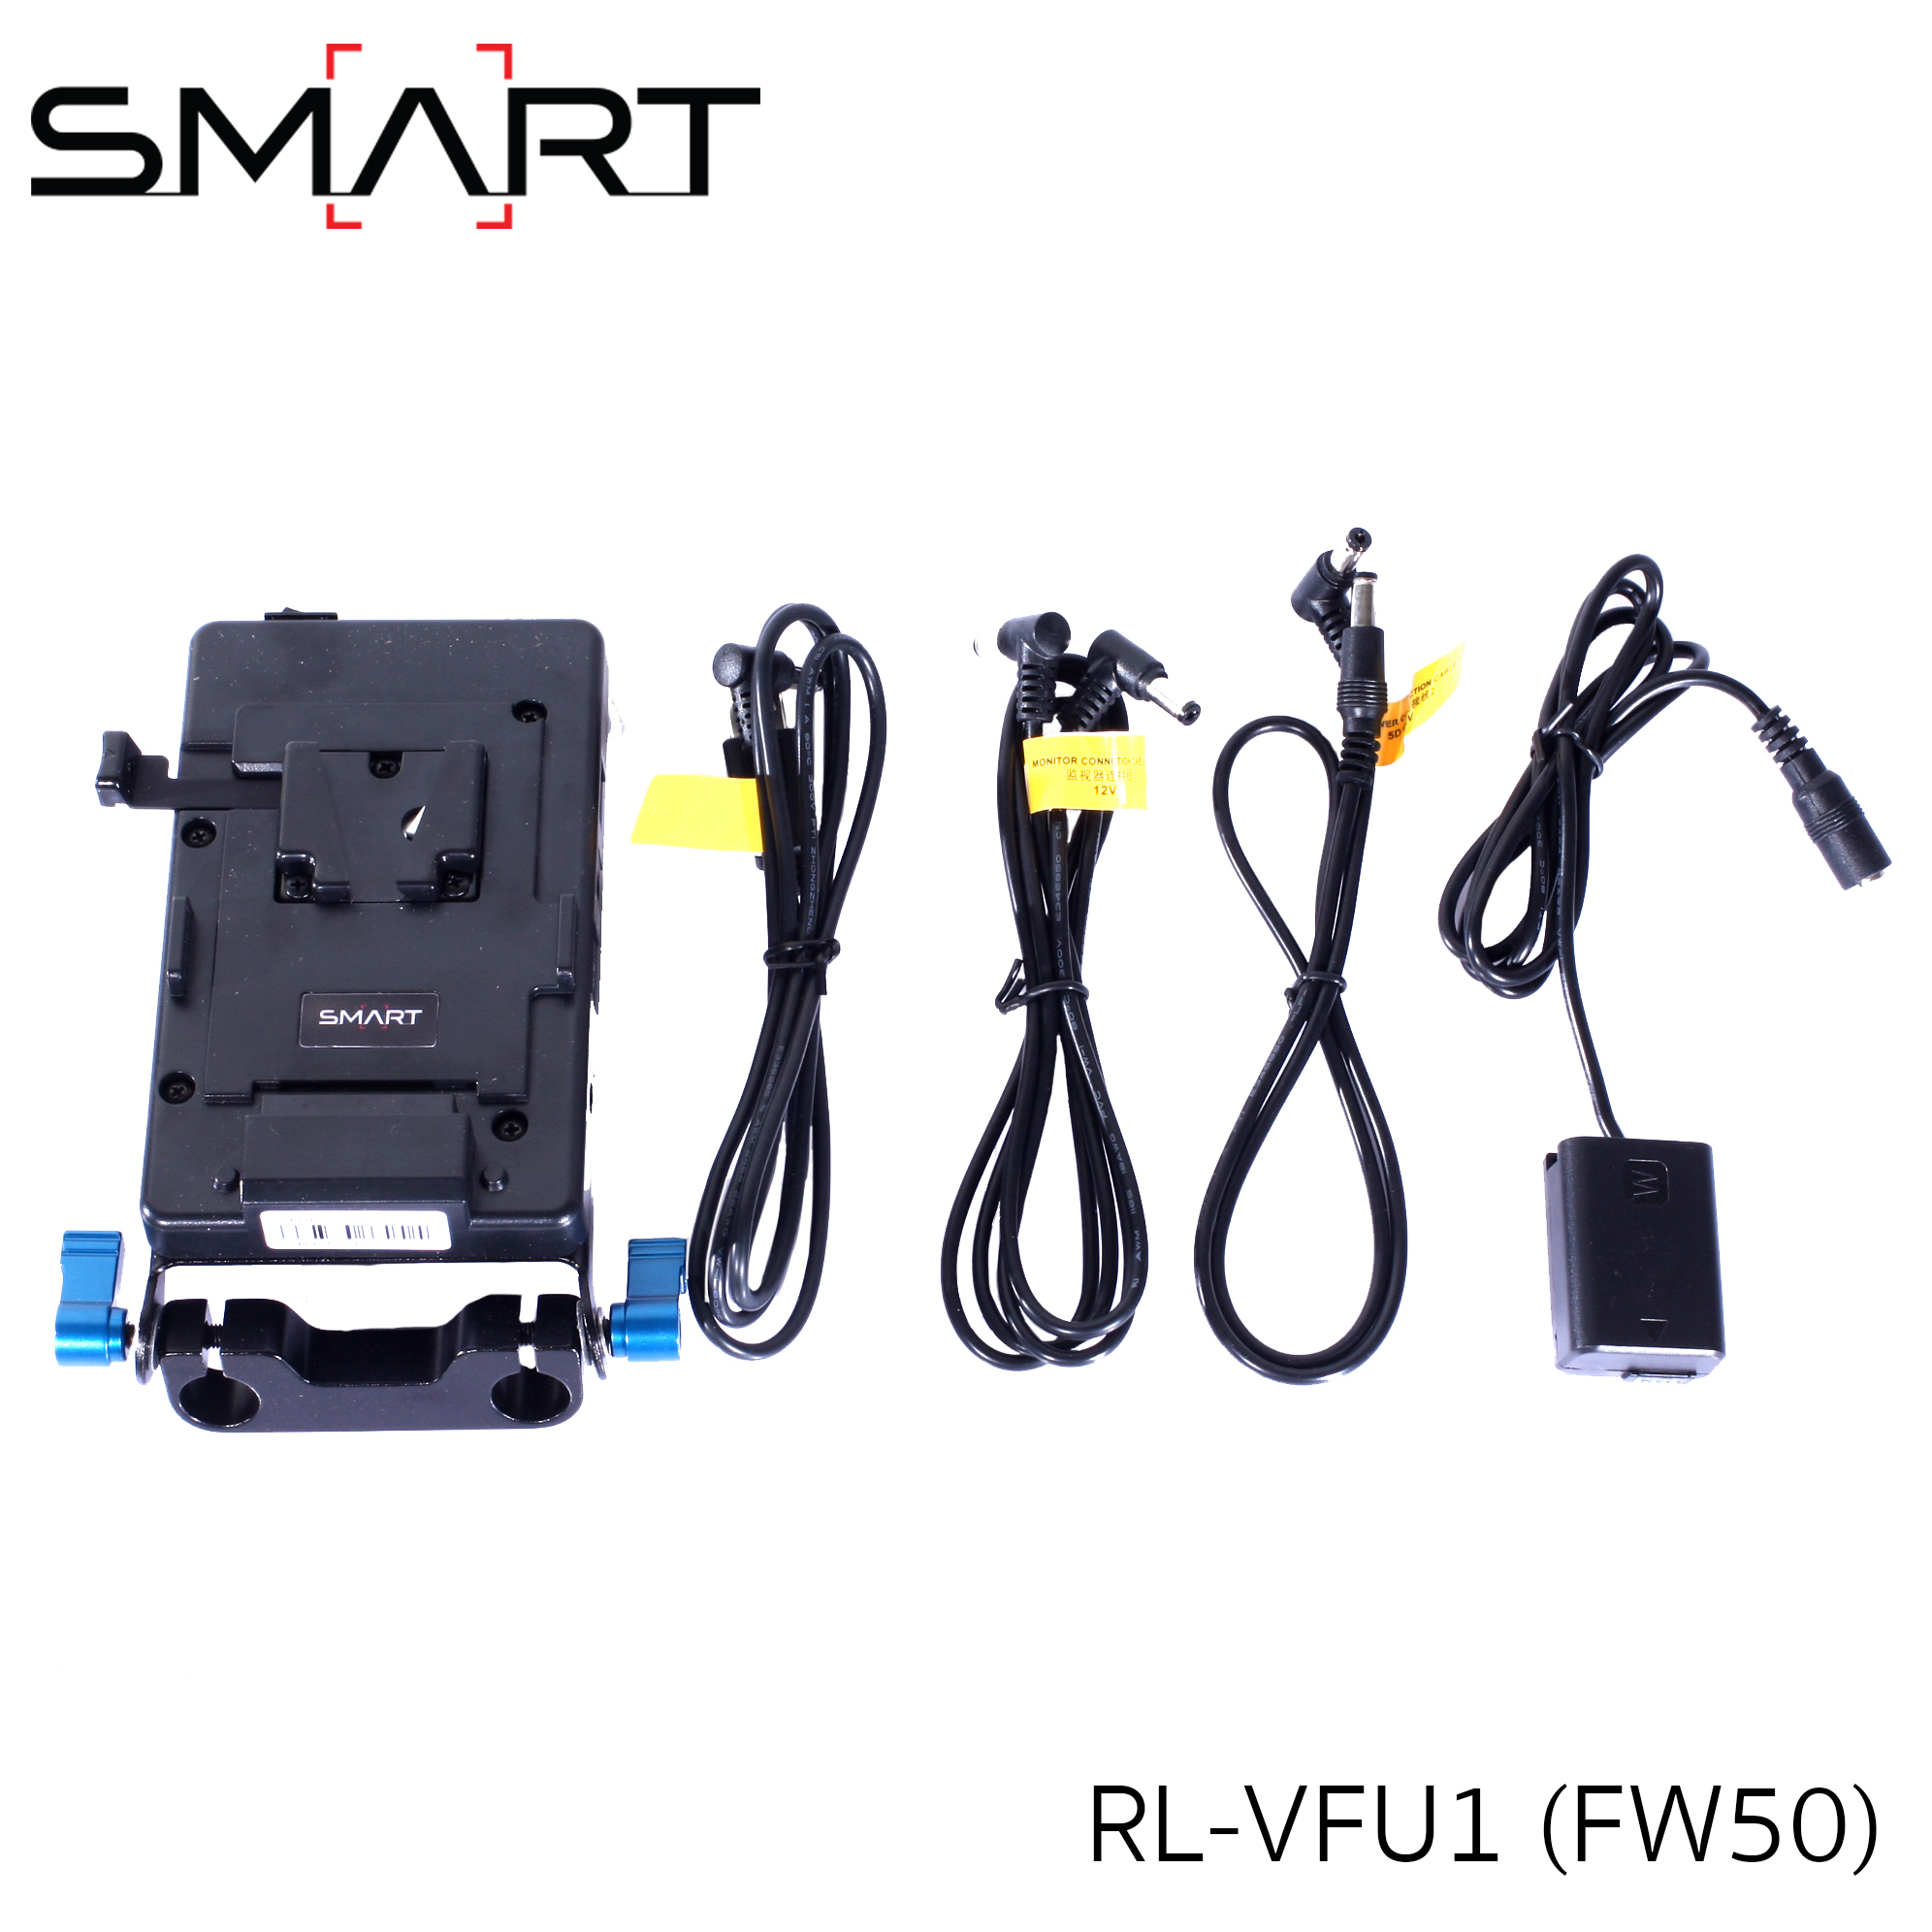 SMART RL-VFU1 Power Supply System For Sony FW50